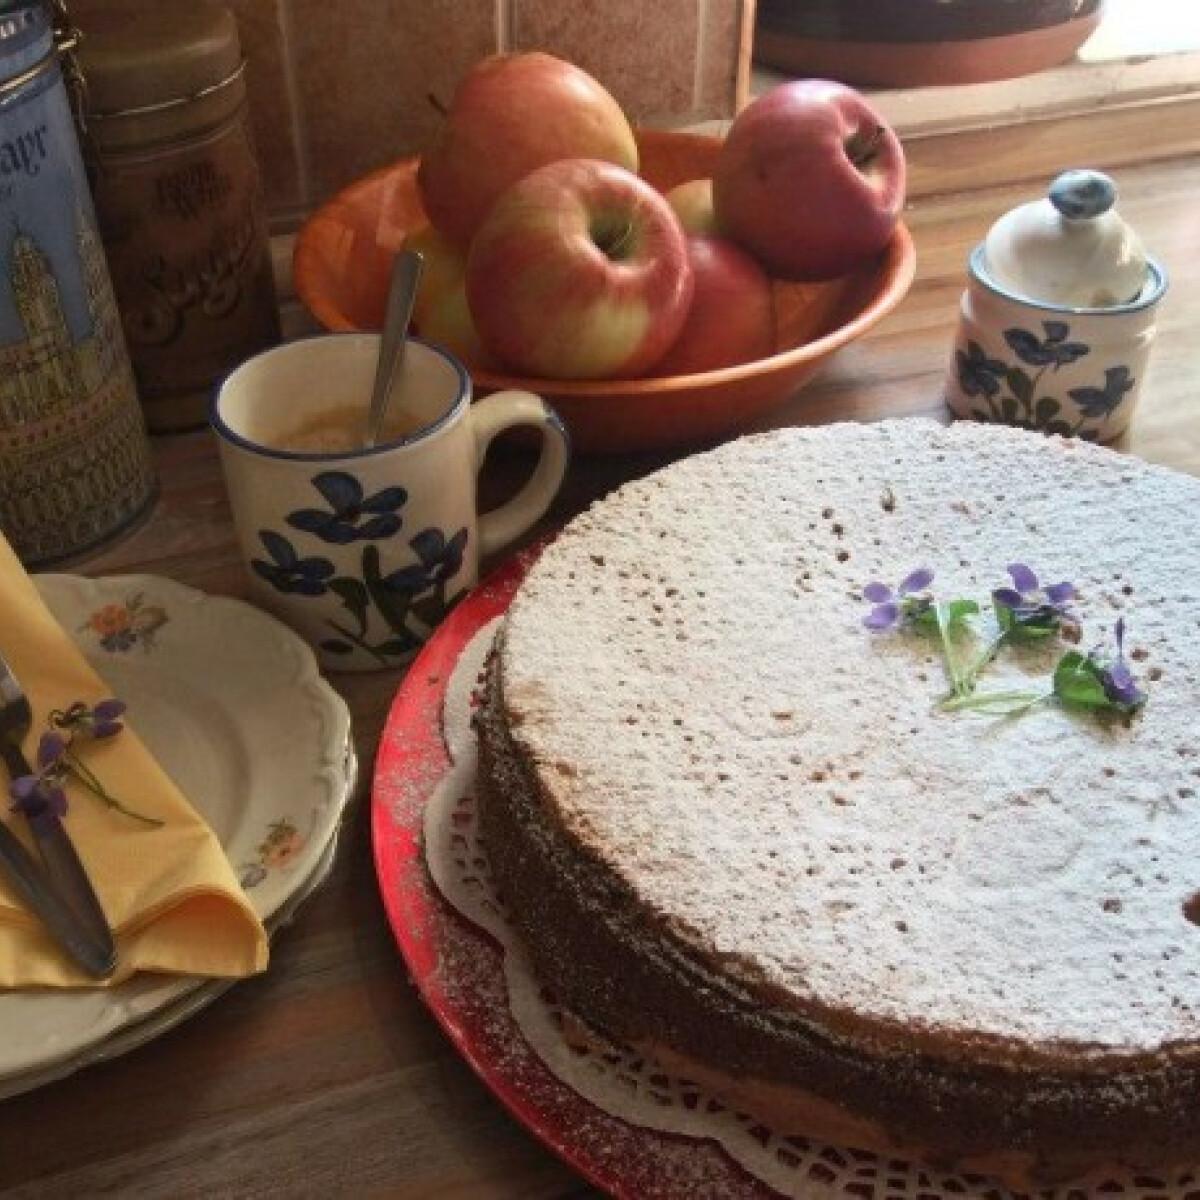 Mákos pite Paskó atya konyhájából